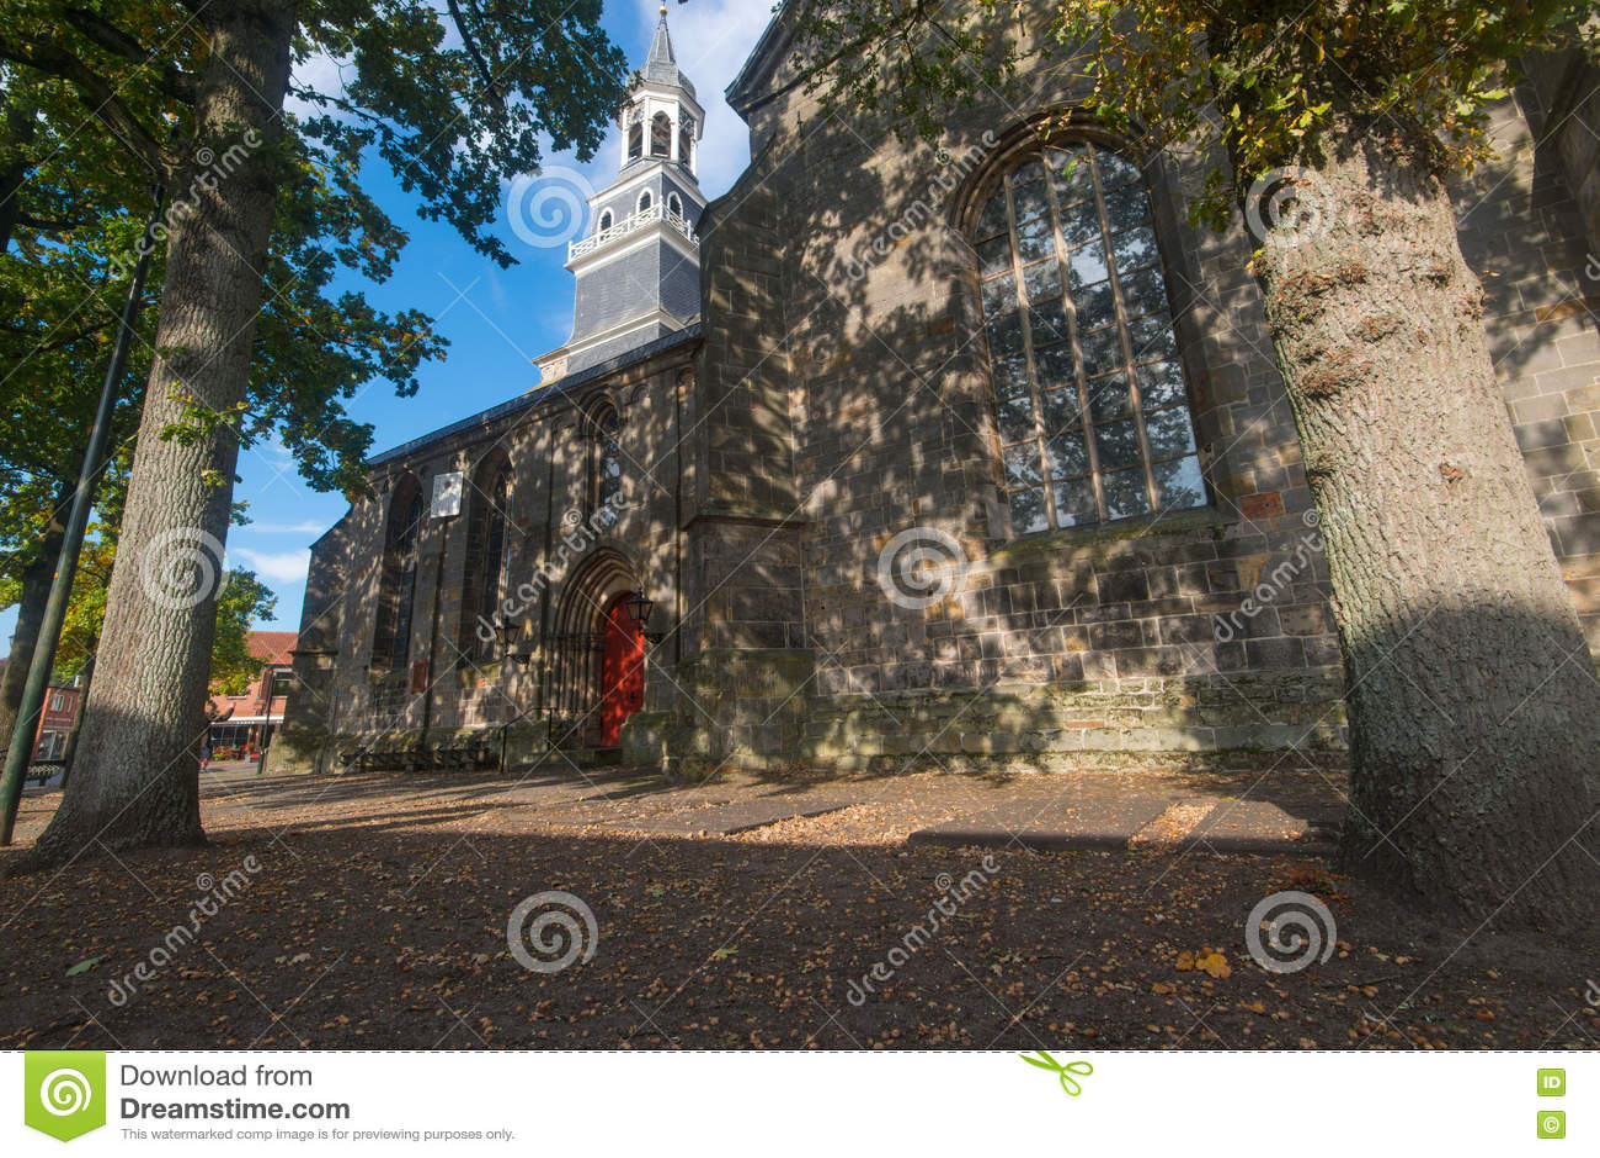 Saint Simon and Judas Church, Ootmarsum